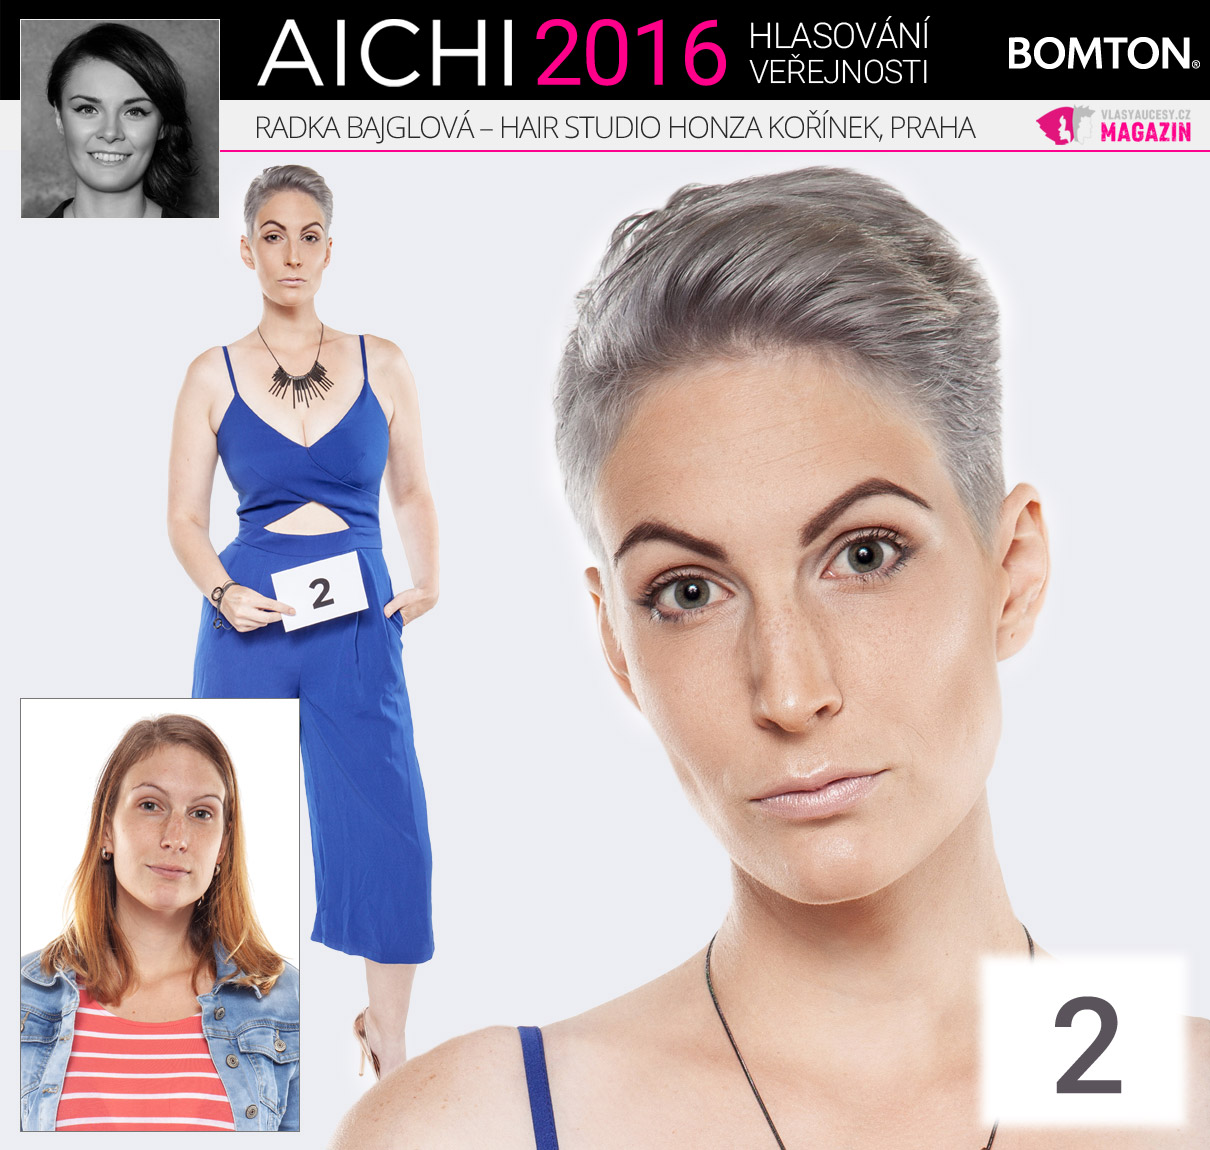 Finálová proměna AICHI 2016: Radka Bajglová, Hair studio Honza Kořínek, Praha